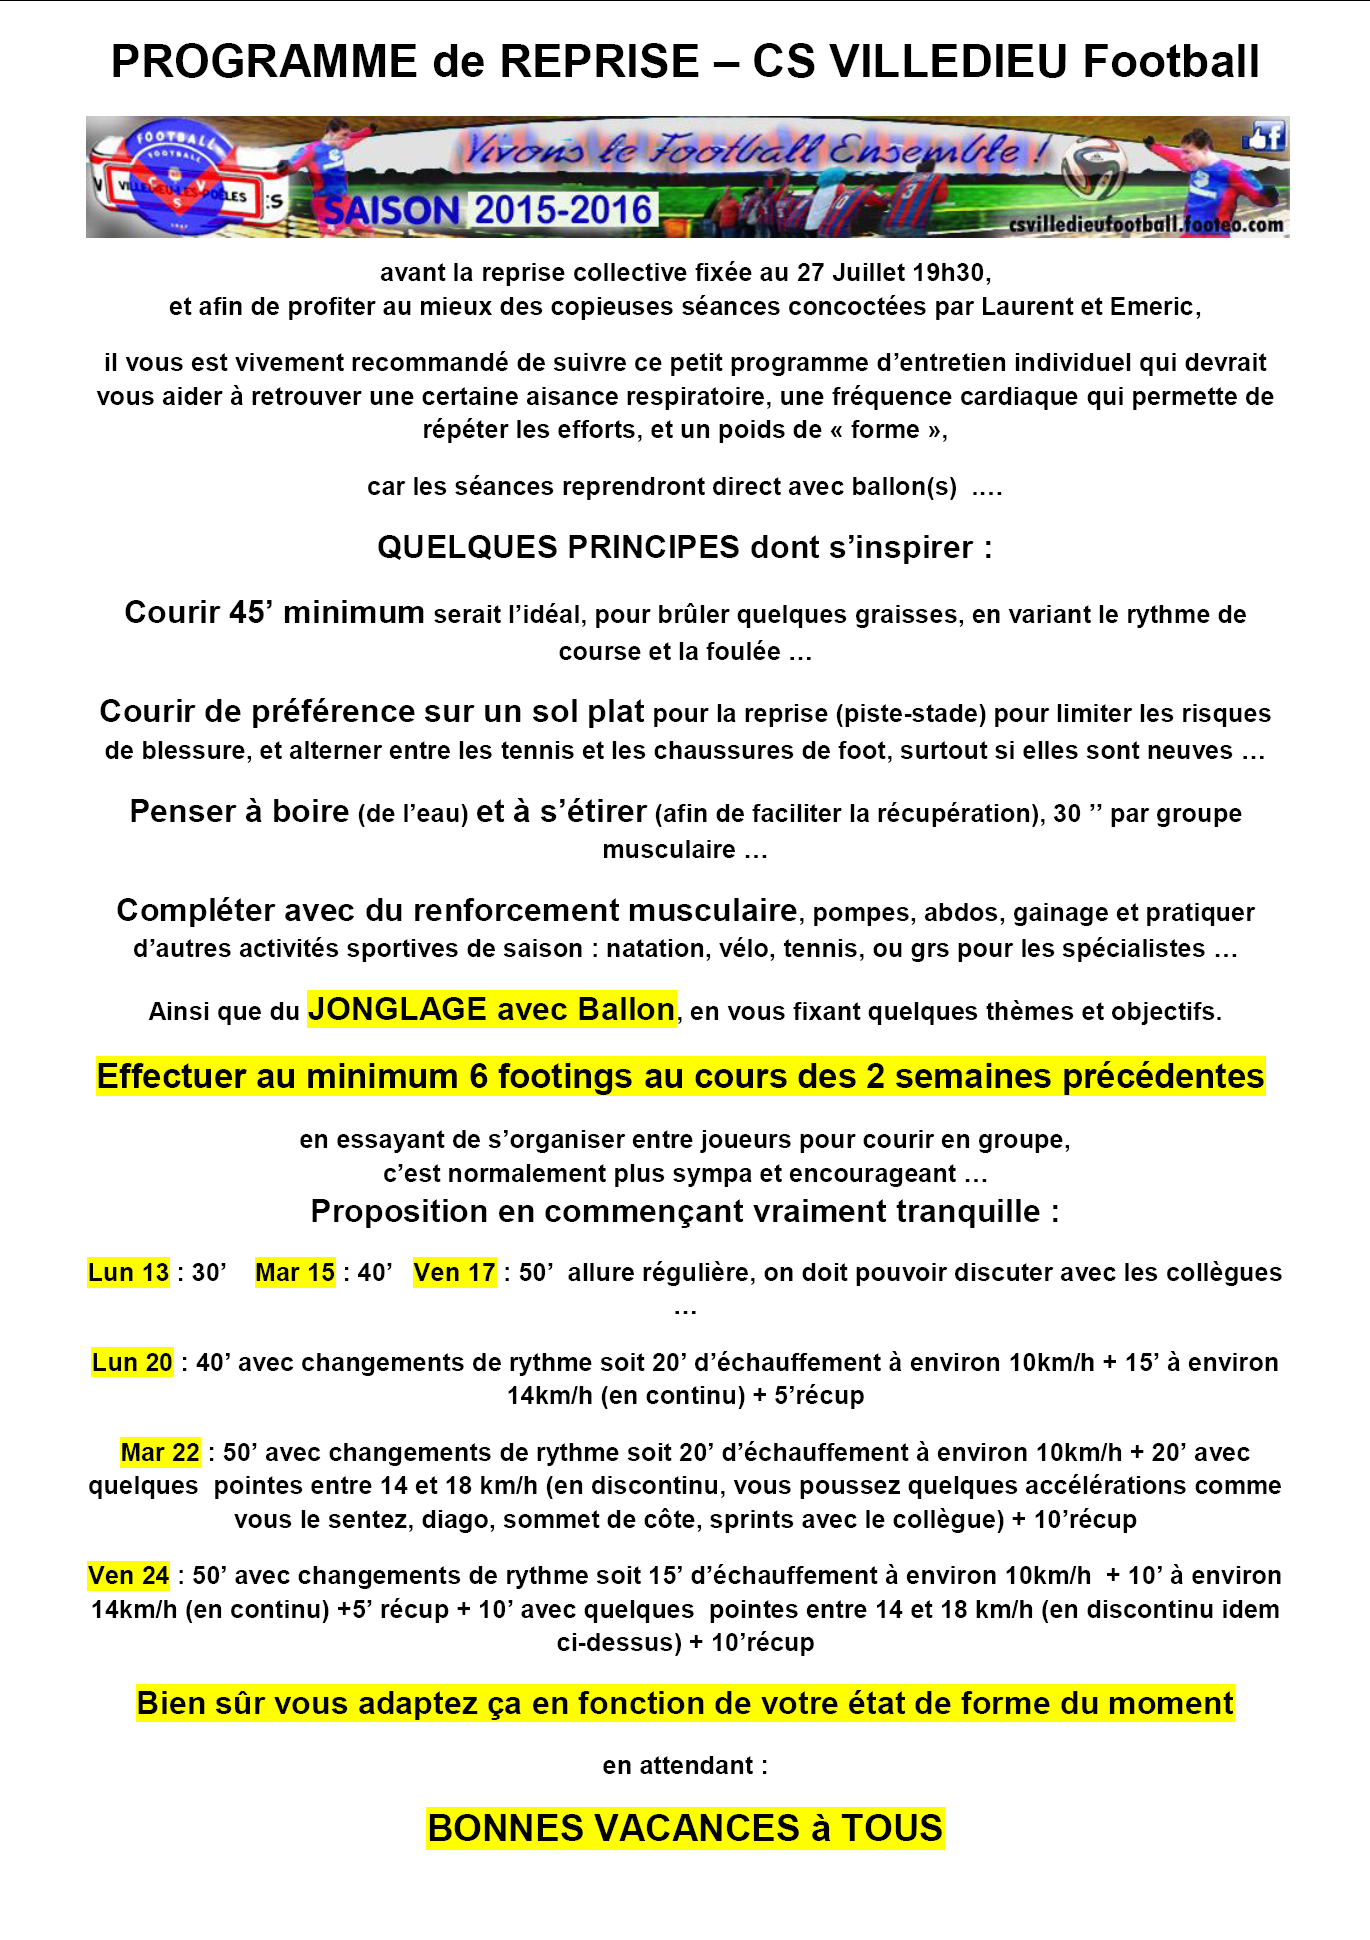 csv-programme-reprise-2015-cs villedieu